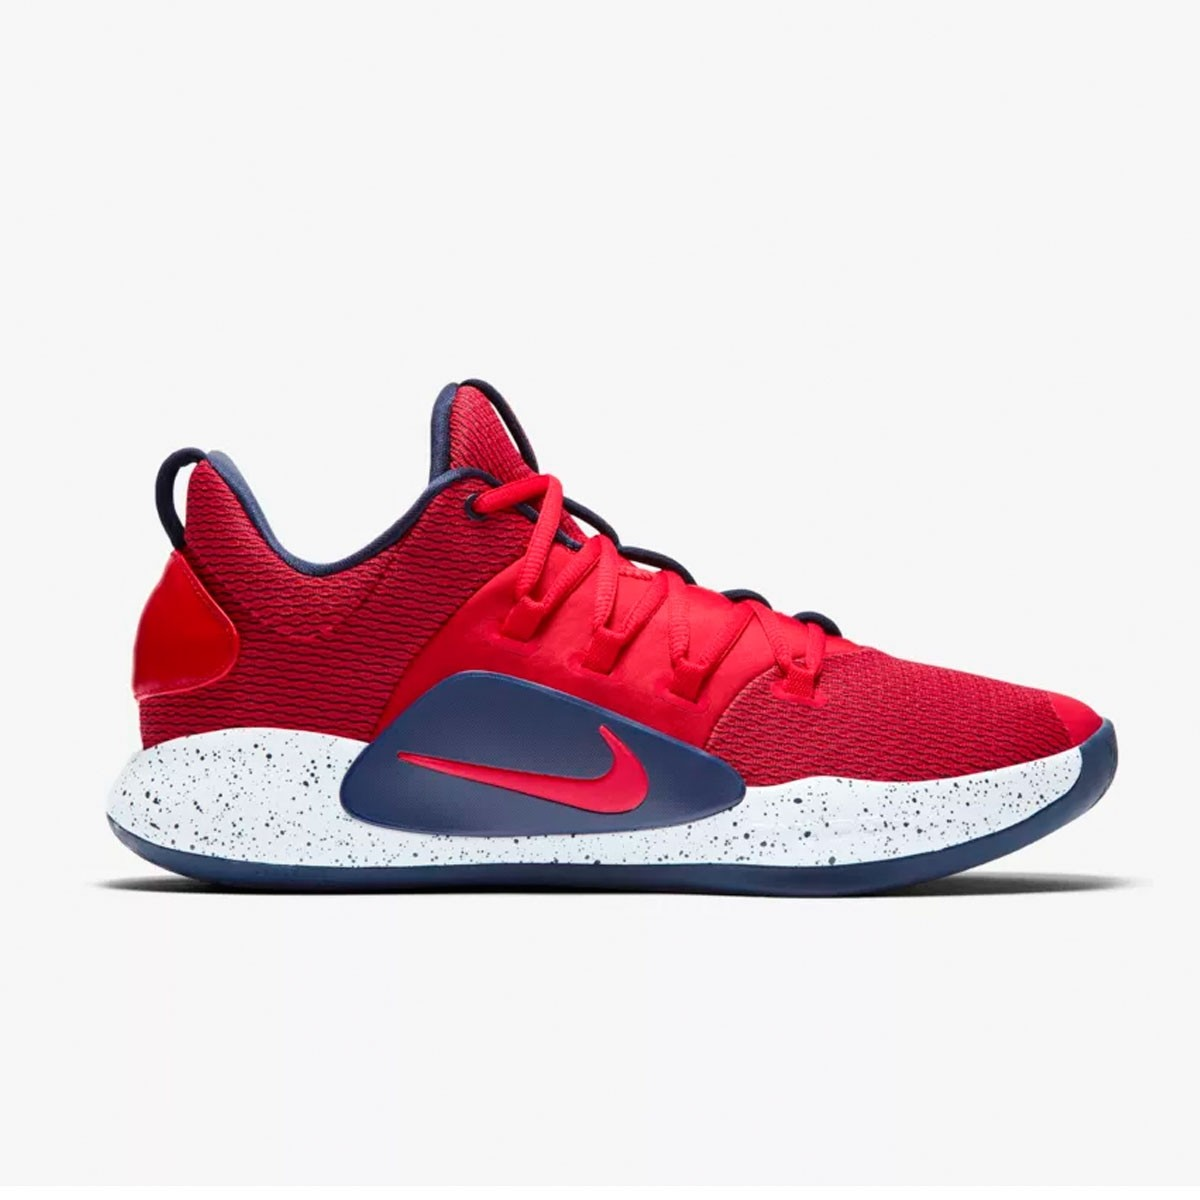 Nike Hyperdunk X Low 2018 GS 'Red Navy'